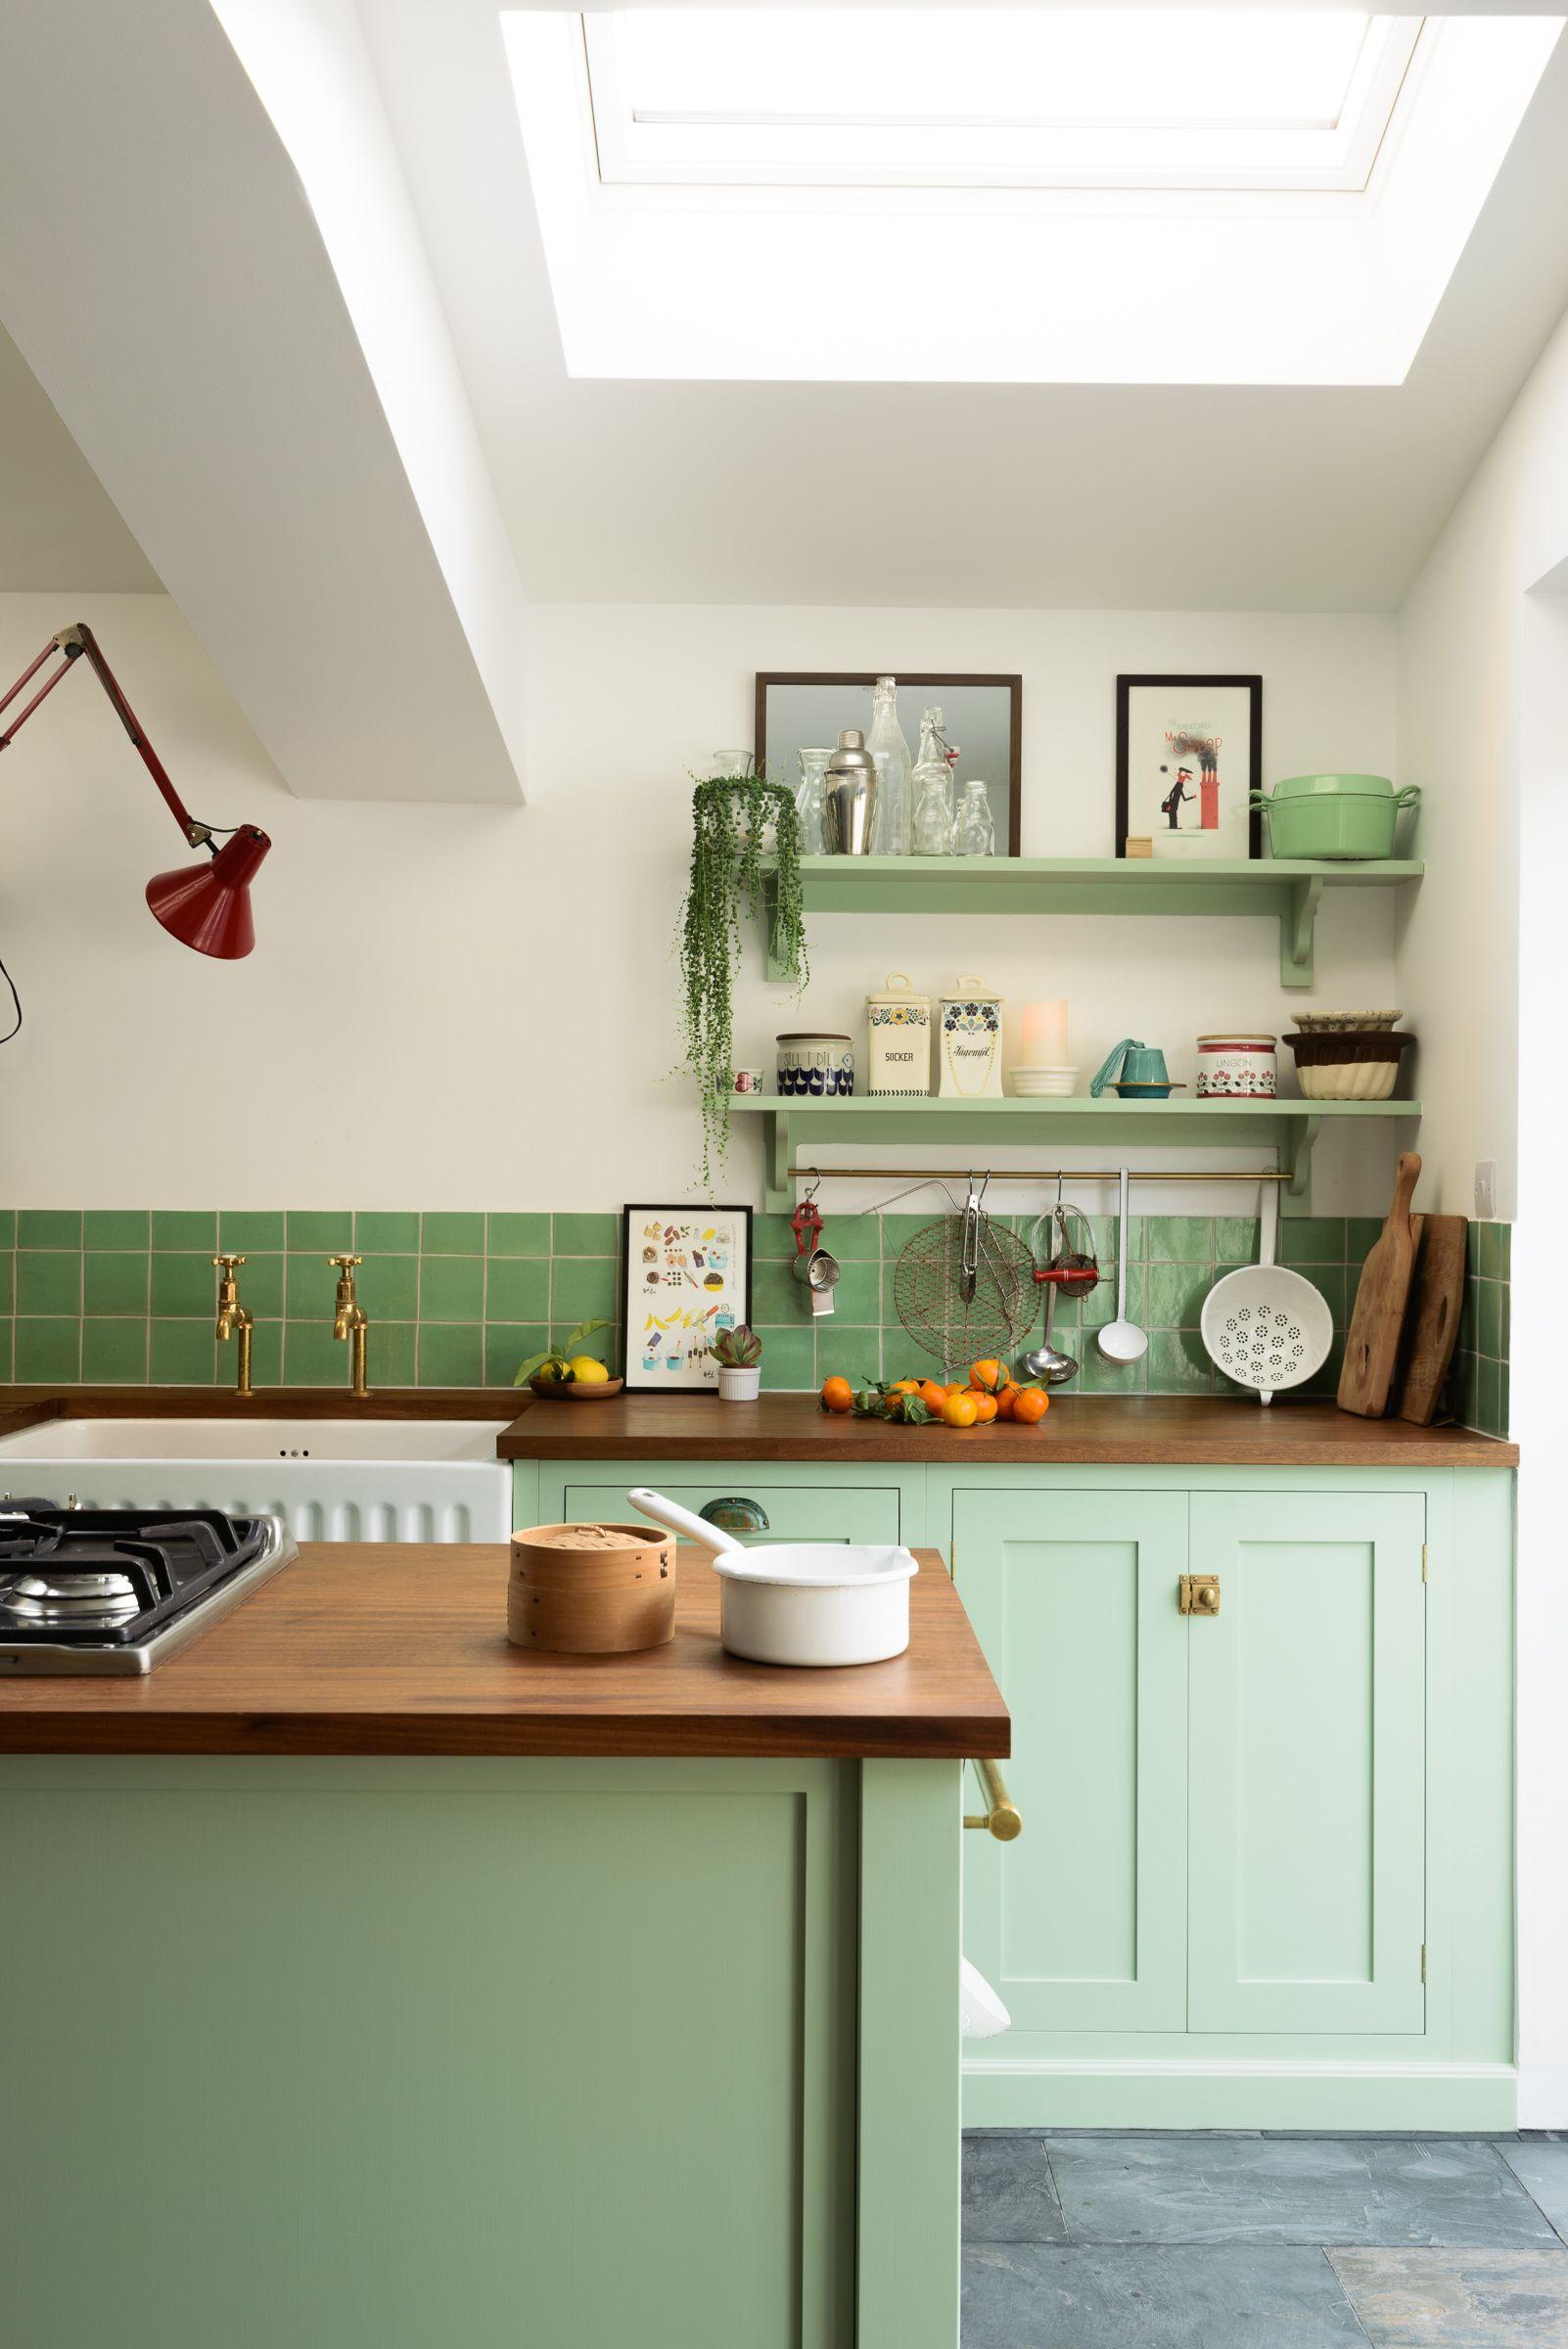 Kitchen colours - modern kitchen colour ideas & 7 Kitchen Colour Ideas - Best Kitchen Paint Colours